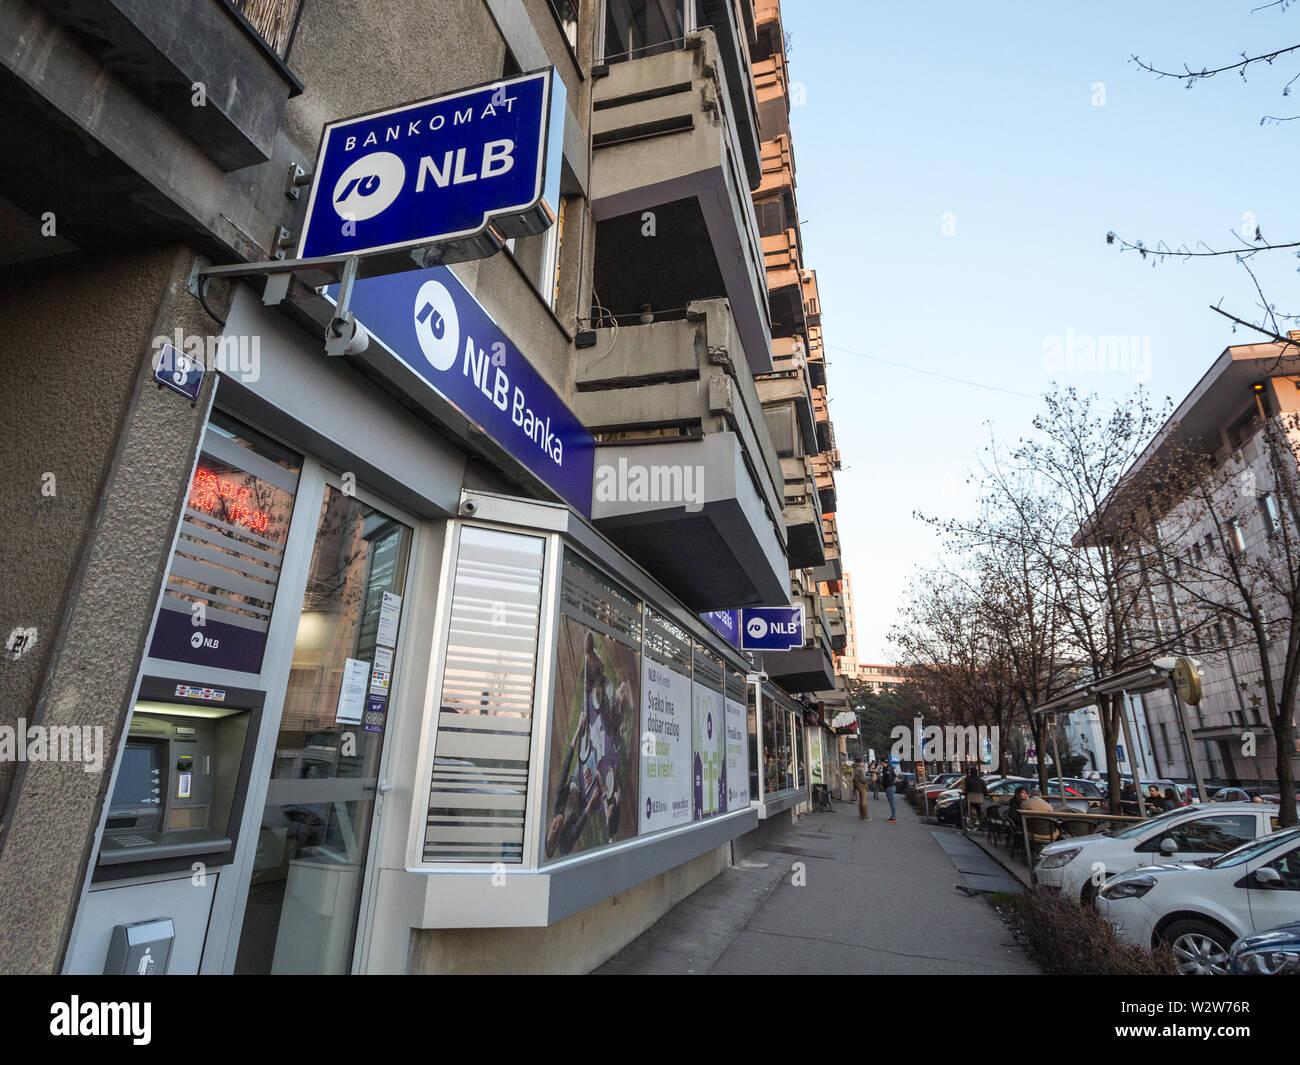 BELGRADE, SERBIA - FEBRUARY 17, 2019: NLB Bank Group logo on their local retail agency for Serbia. NLB Group, formerly Ljubljanska Banka, is a Sloveni - Stock Image